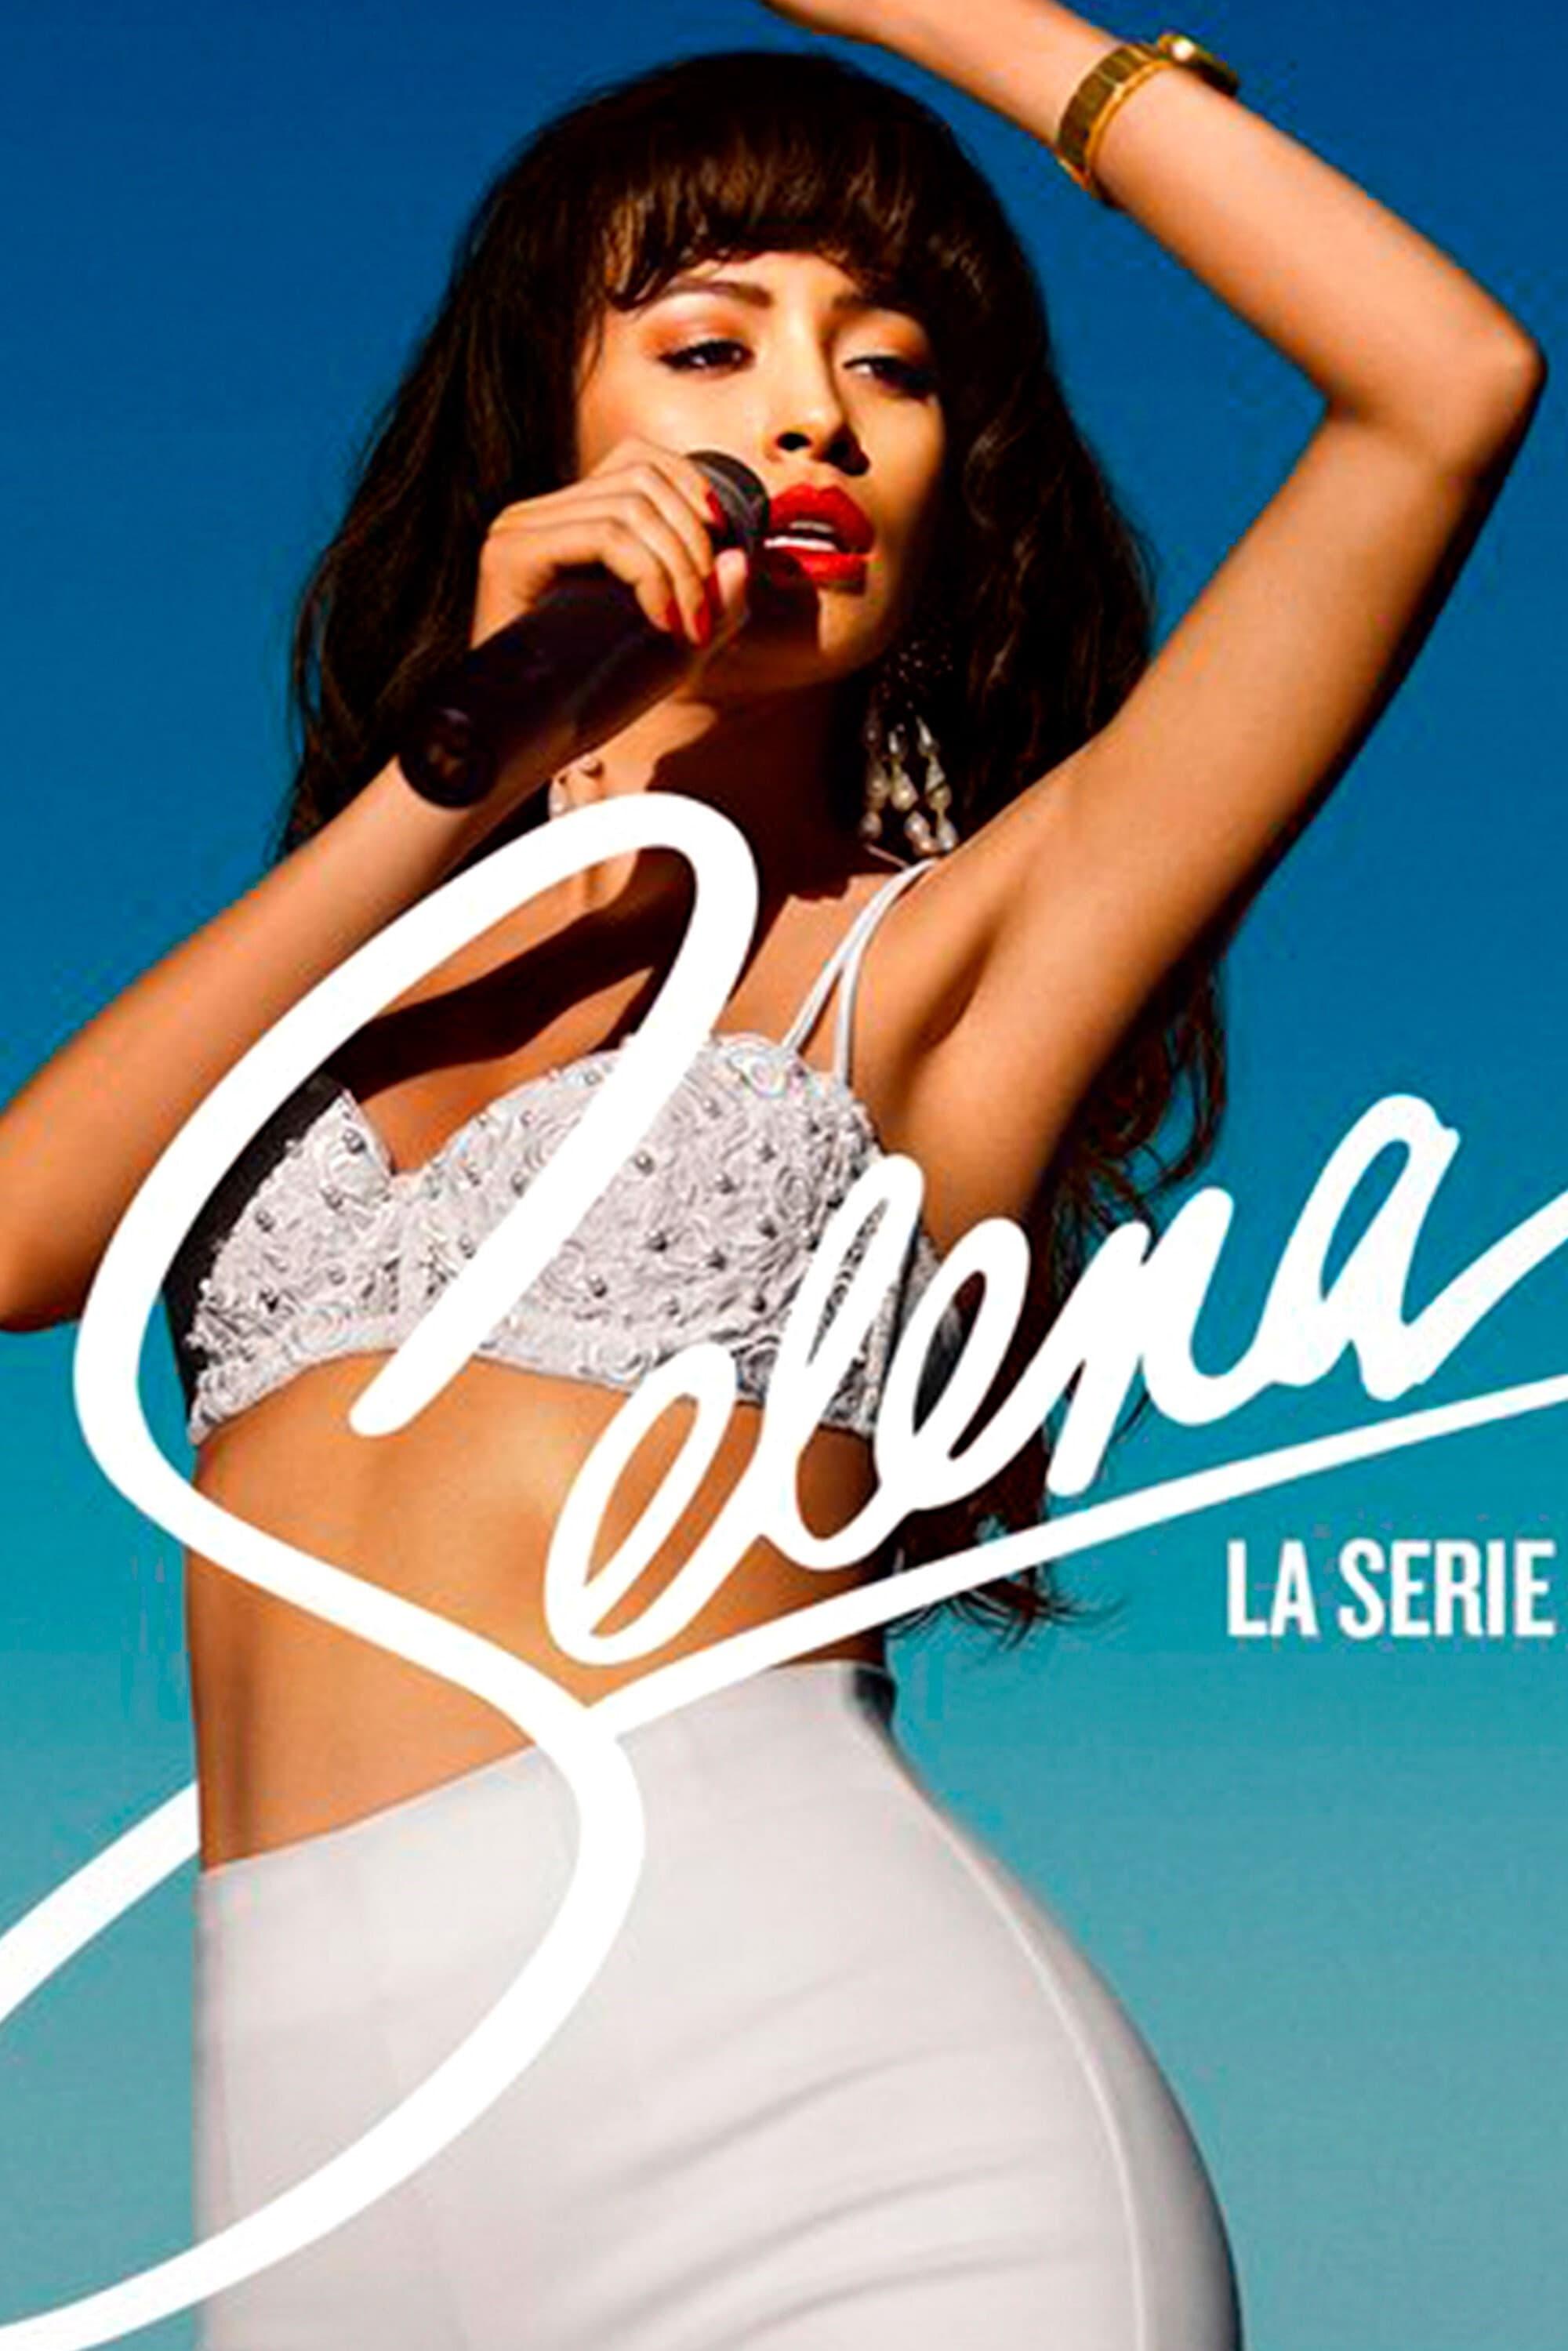 Selena: La serie poster